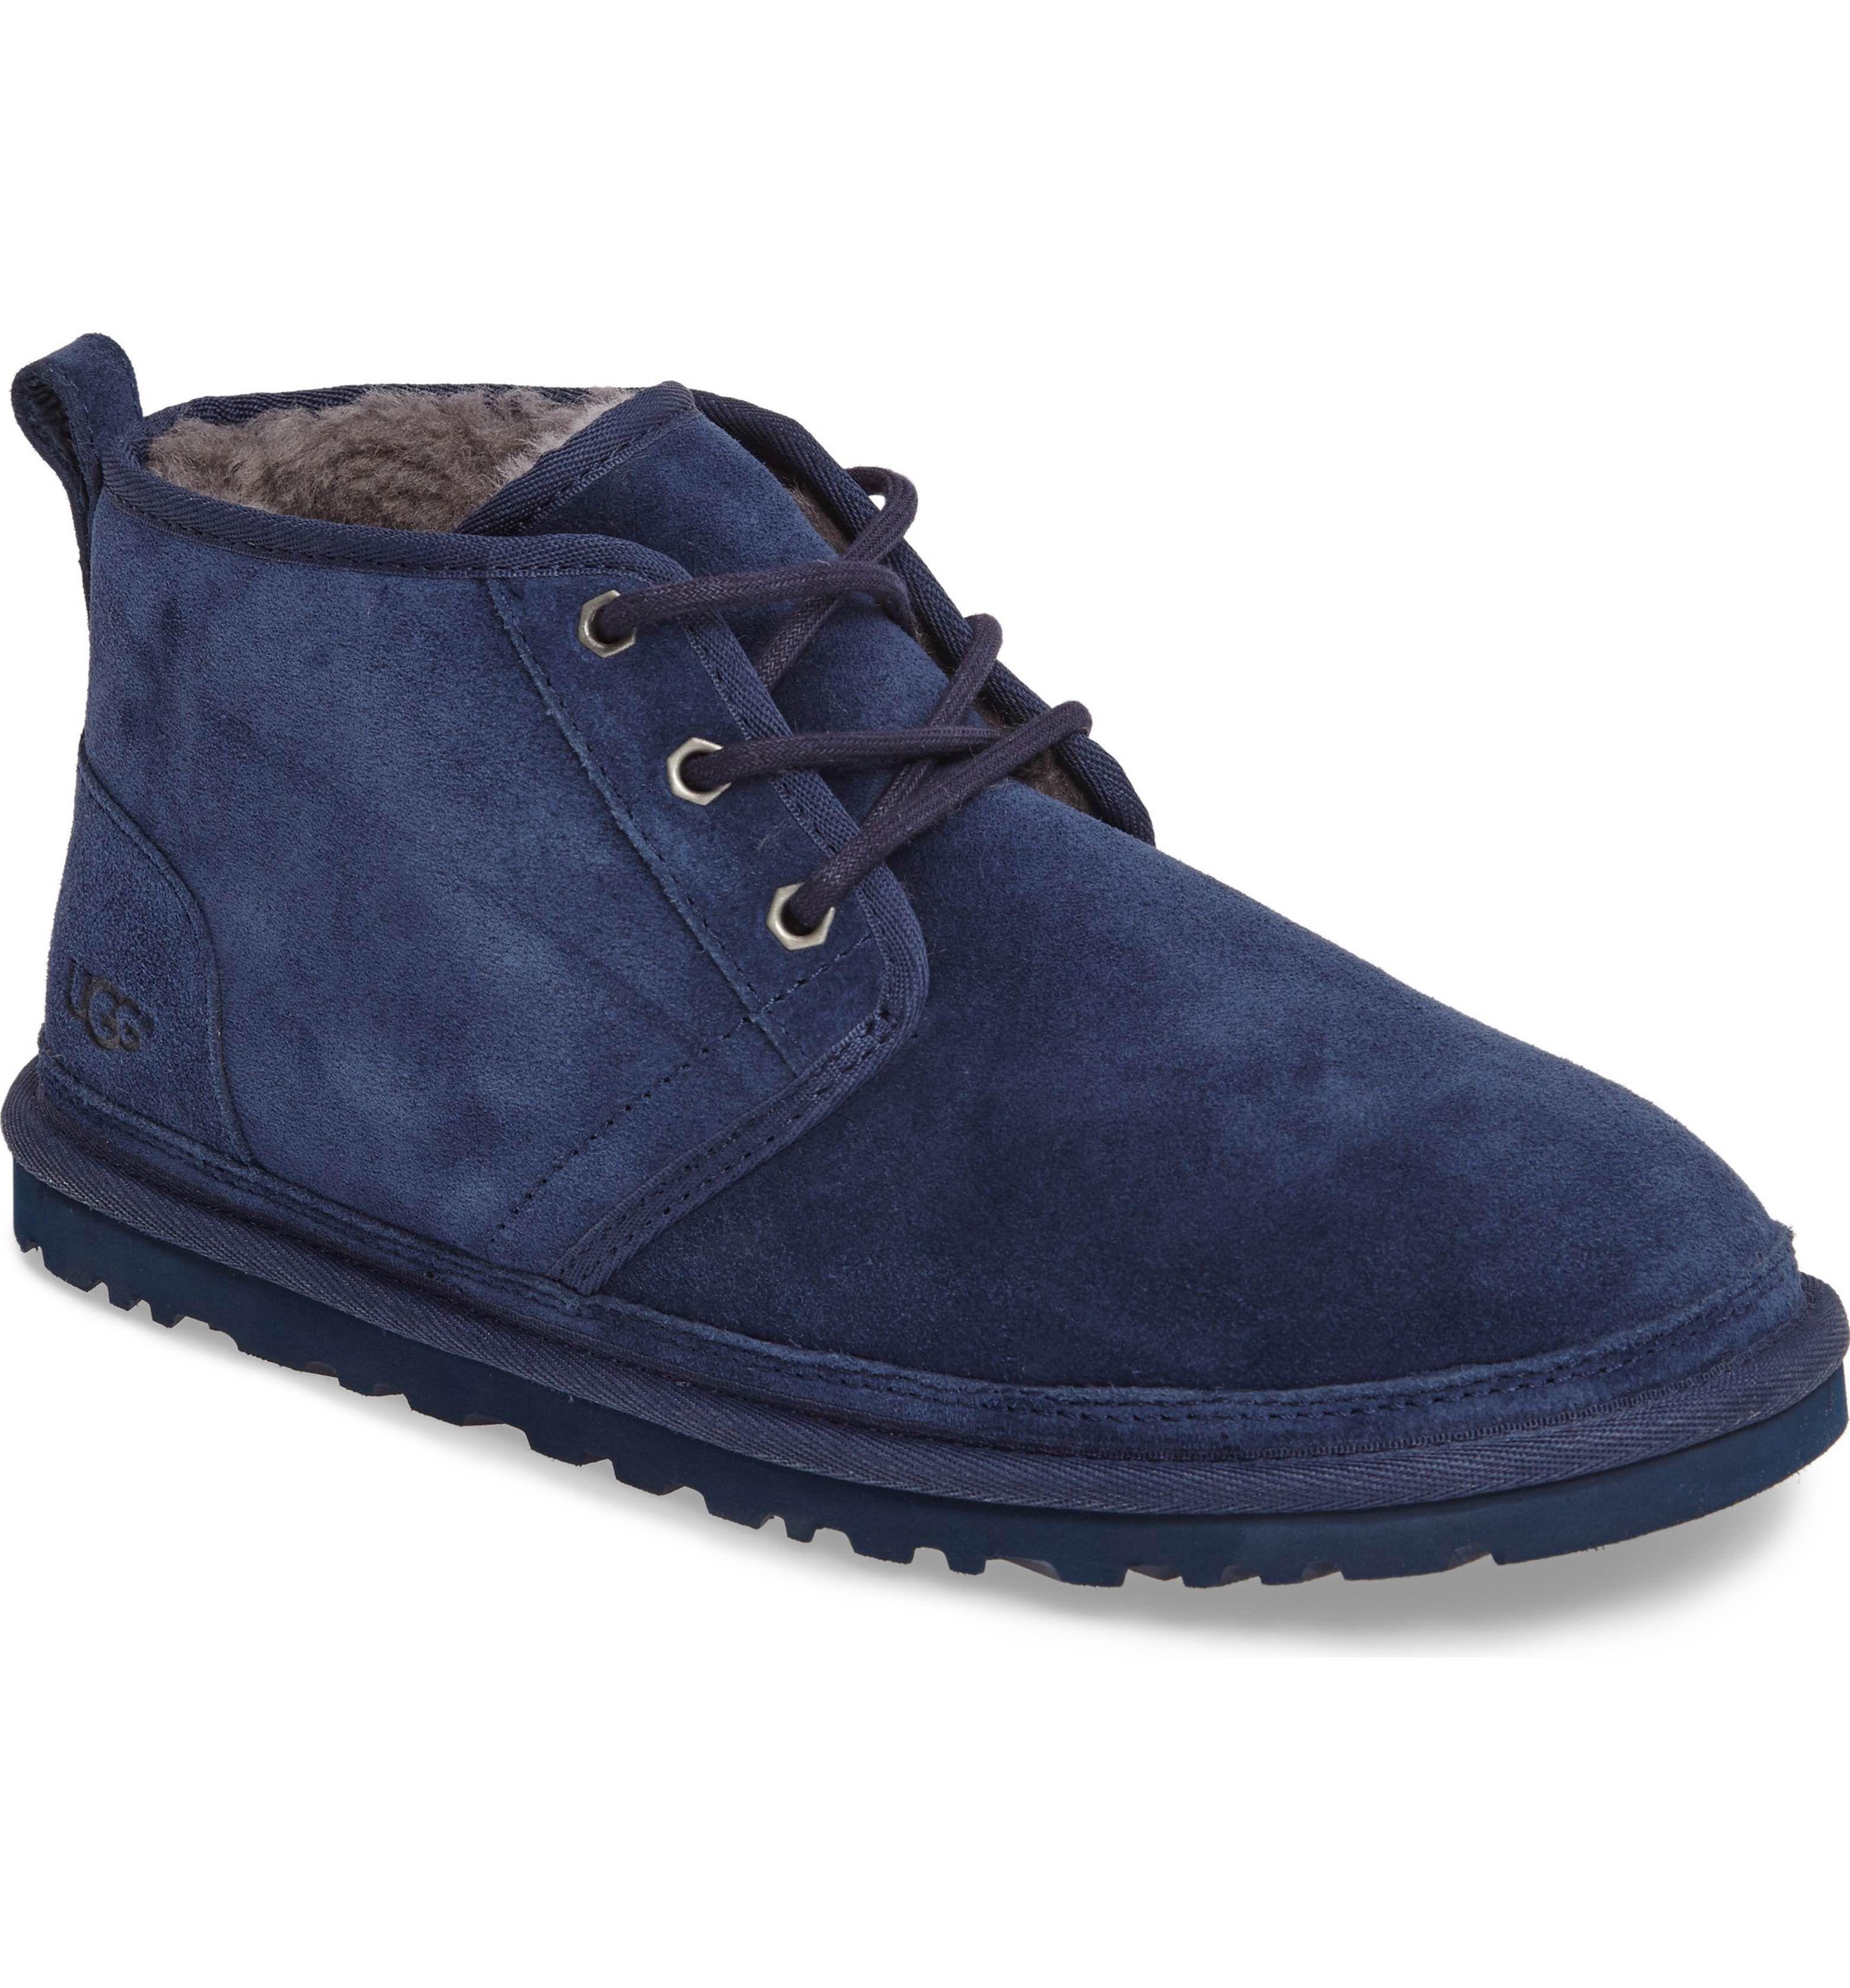 35794360a000 Main Image - UGG® Neumel Chukka Boot (Men)